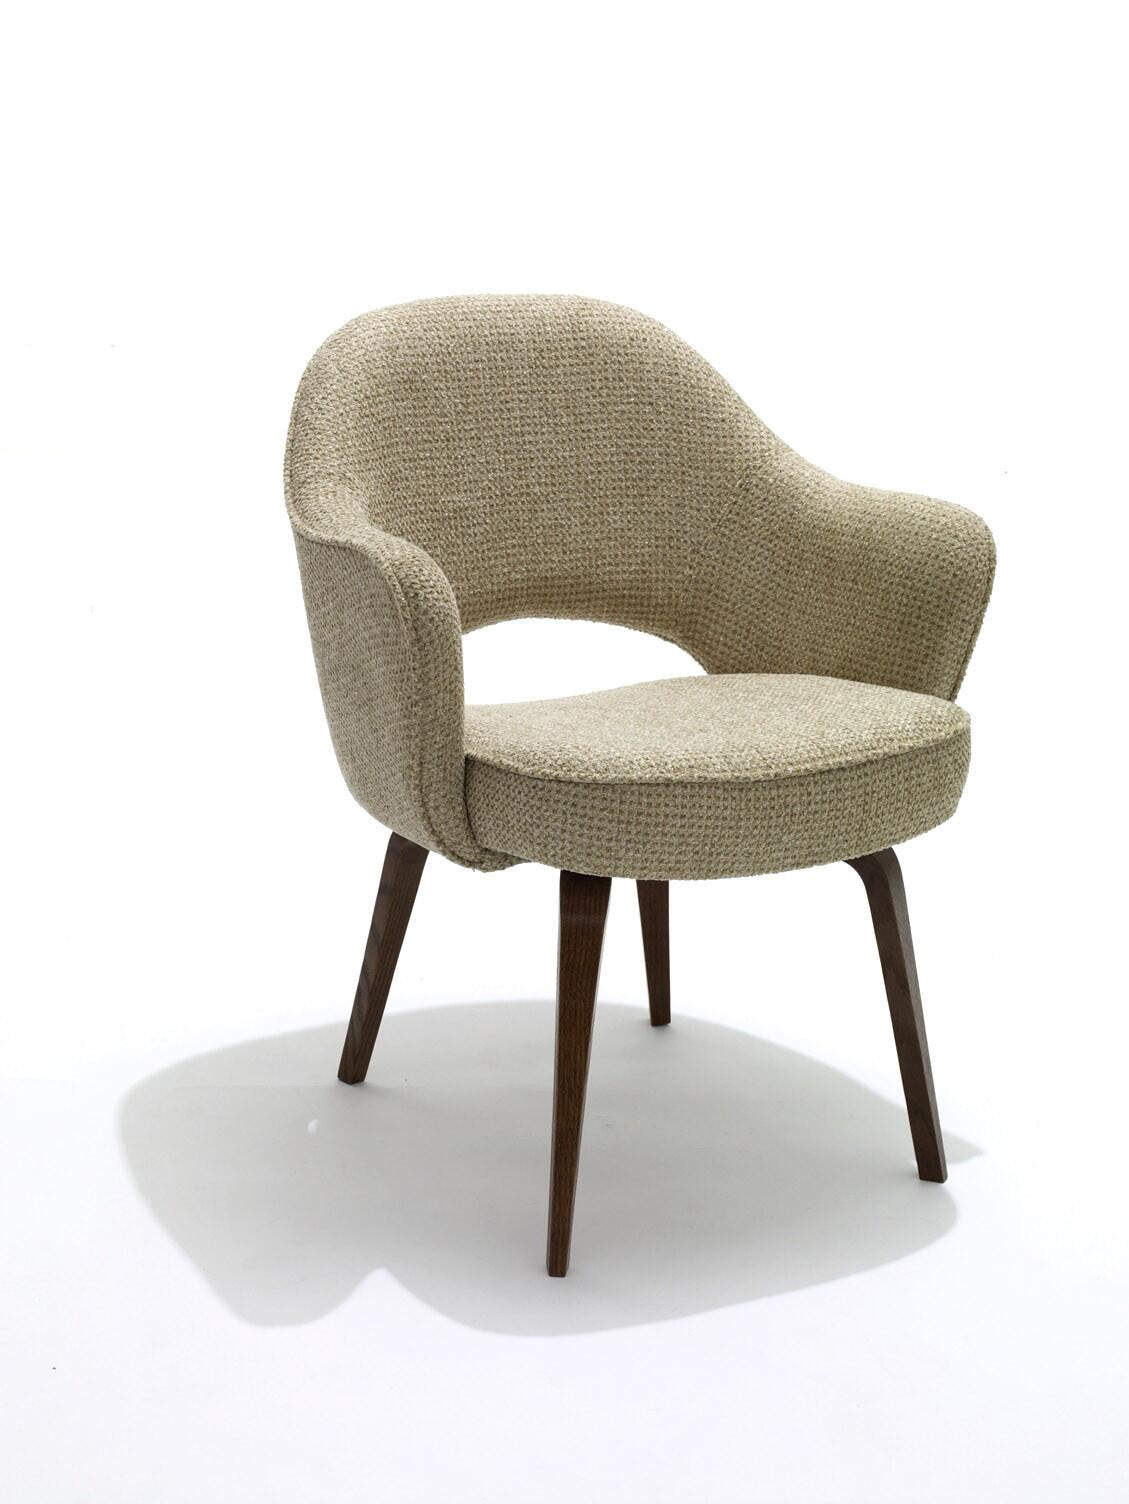 Saarinen Wooden Leg Chairs Office Seating Apres Furniture